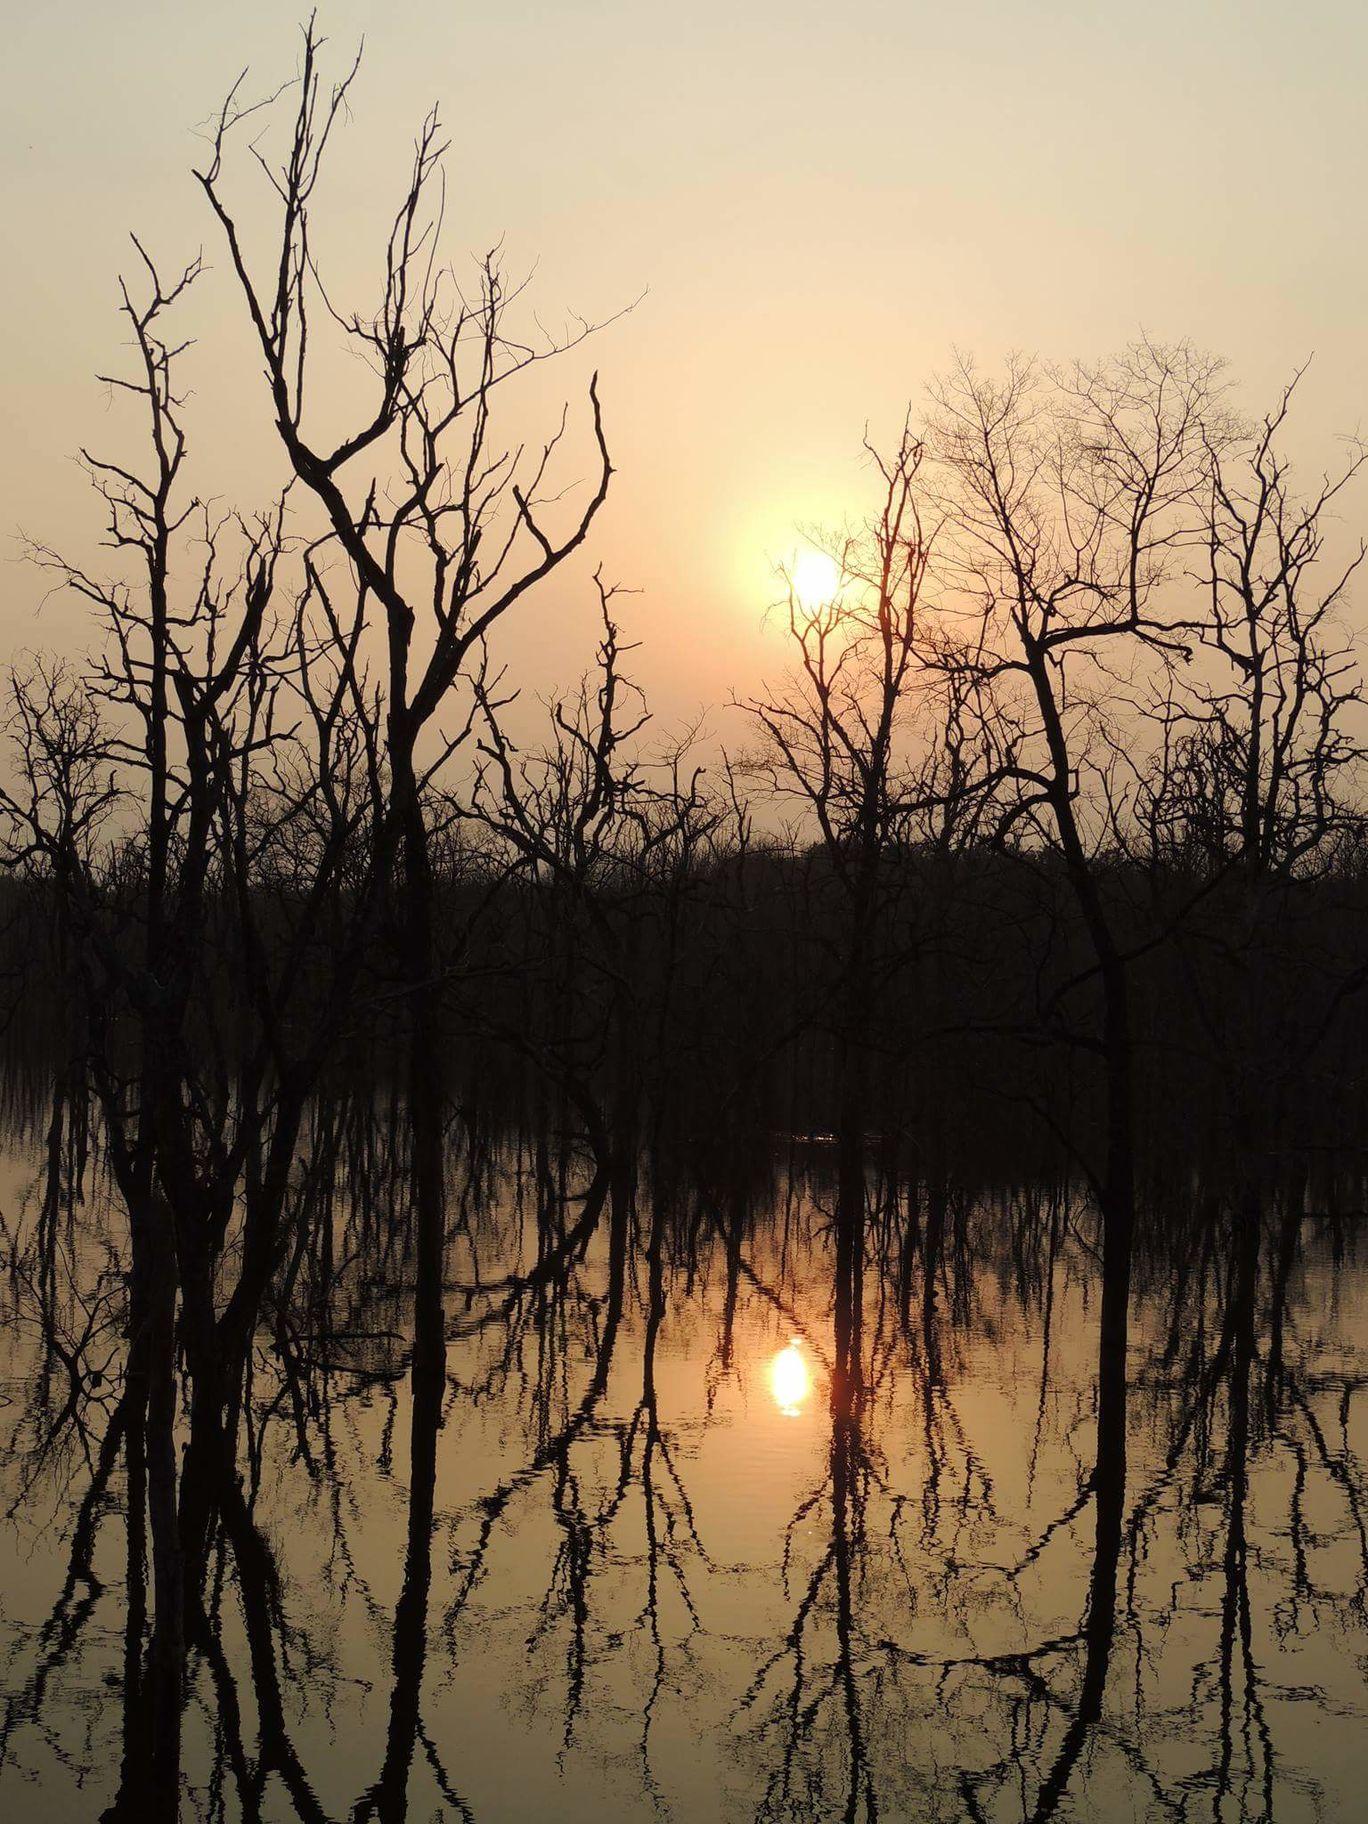 Photo of Barnawapara Forest Range By Jitendra Kumar Sahu